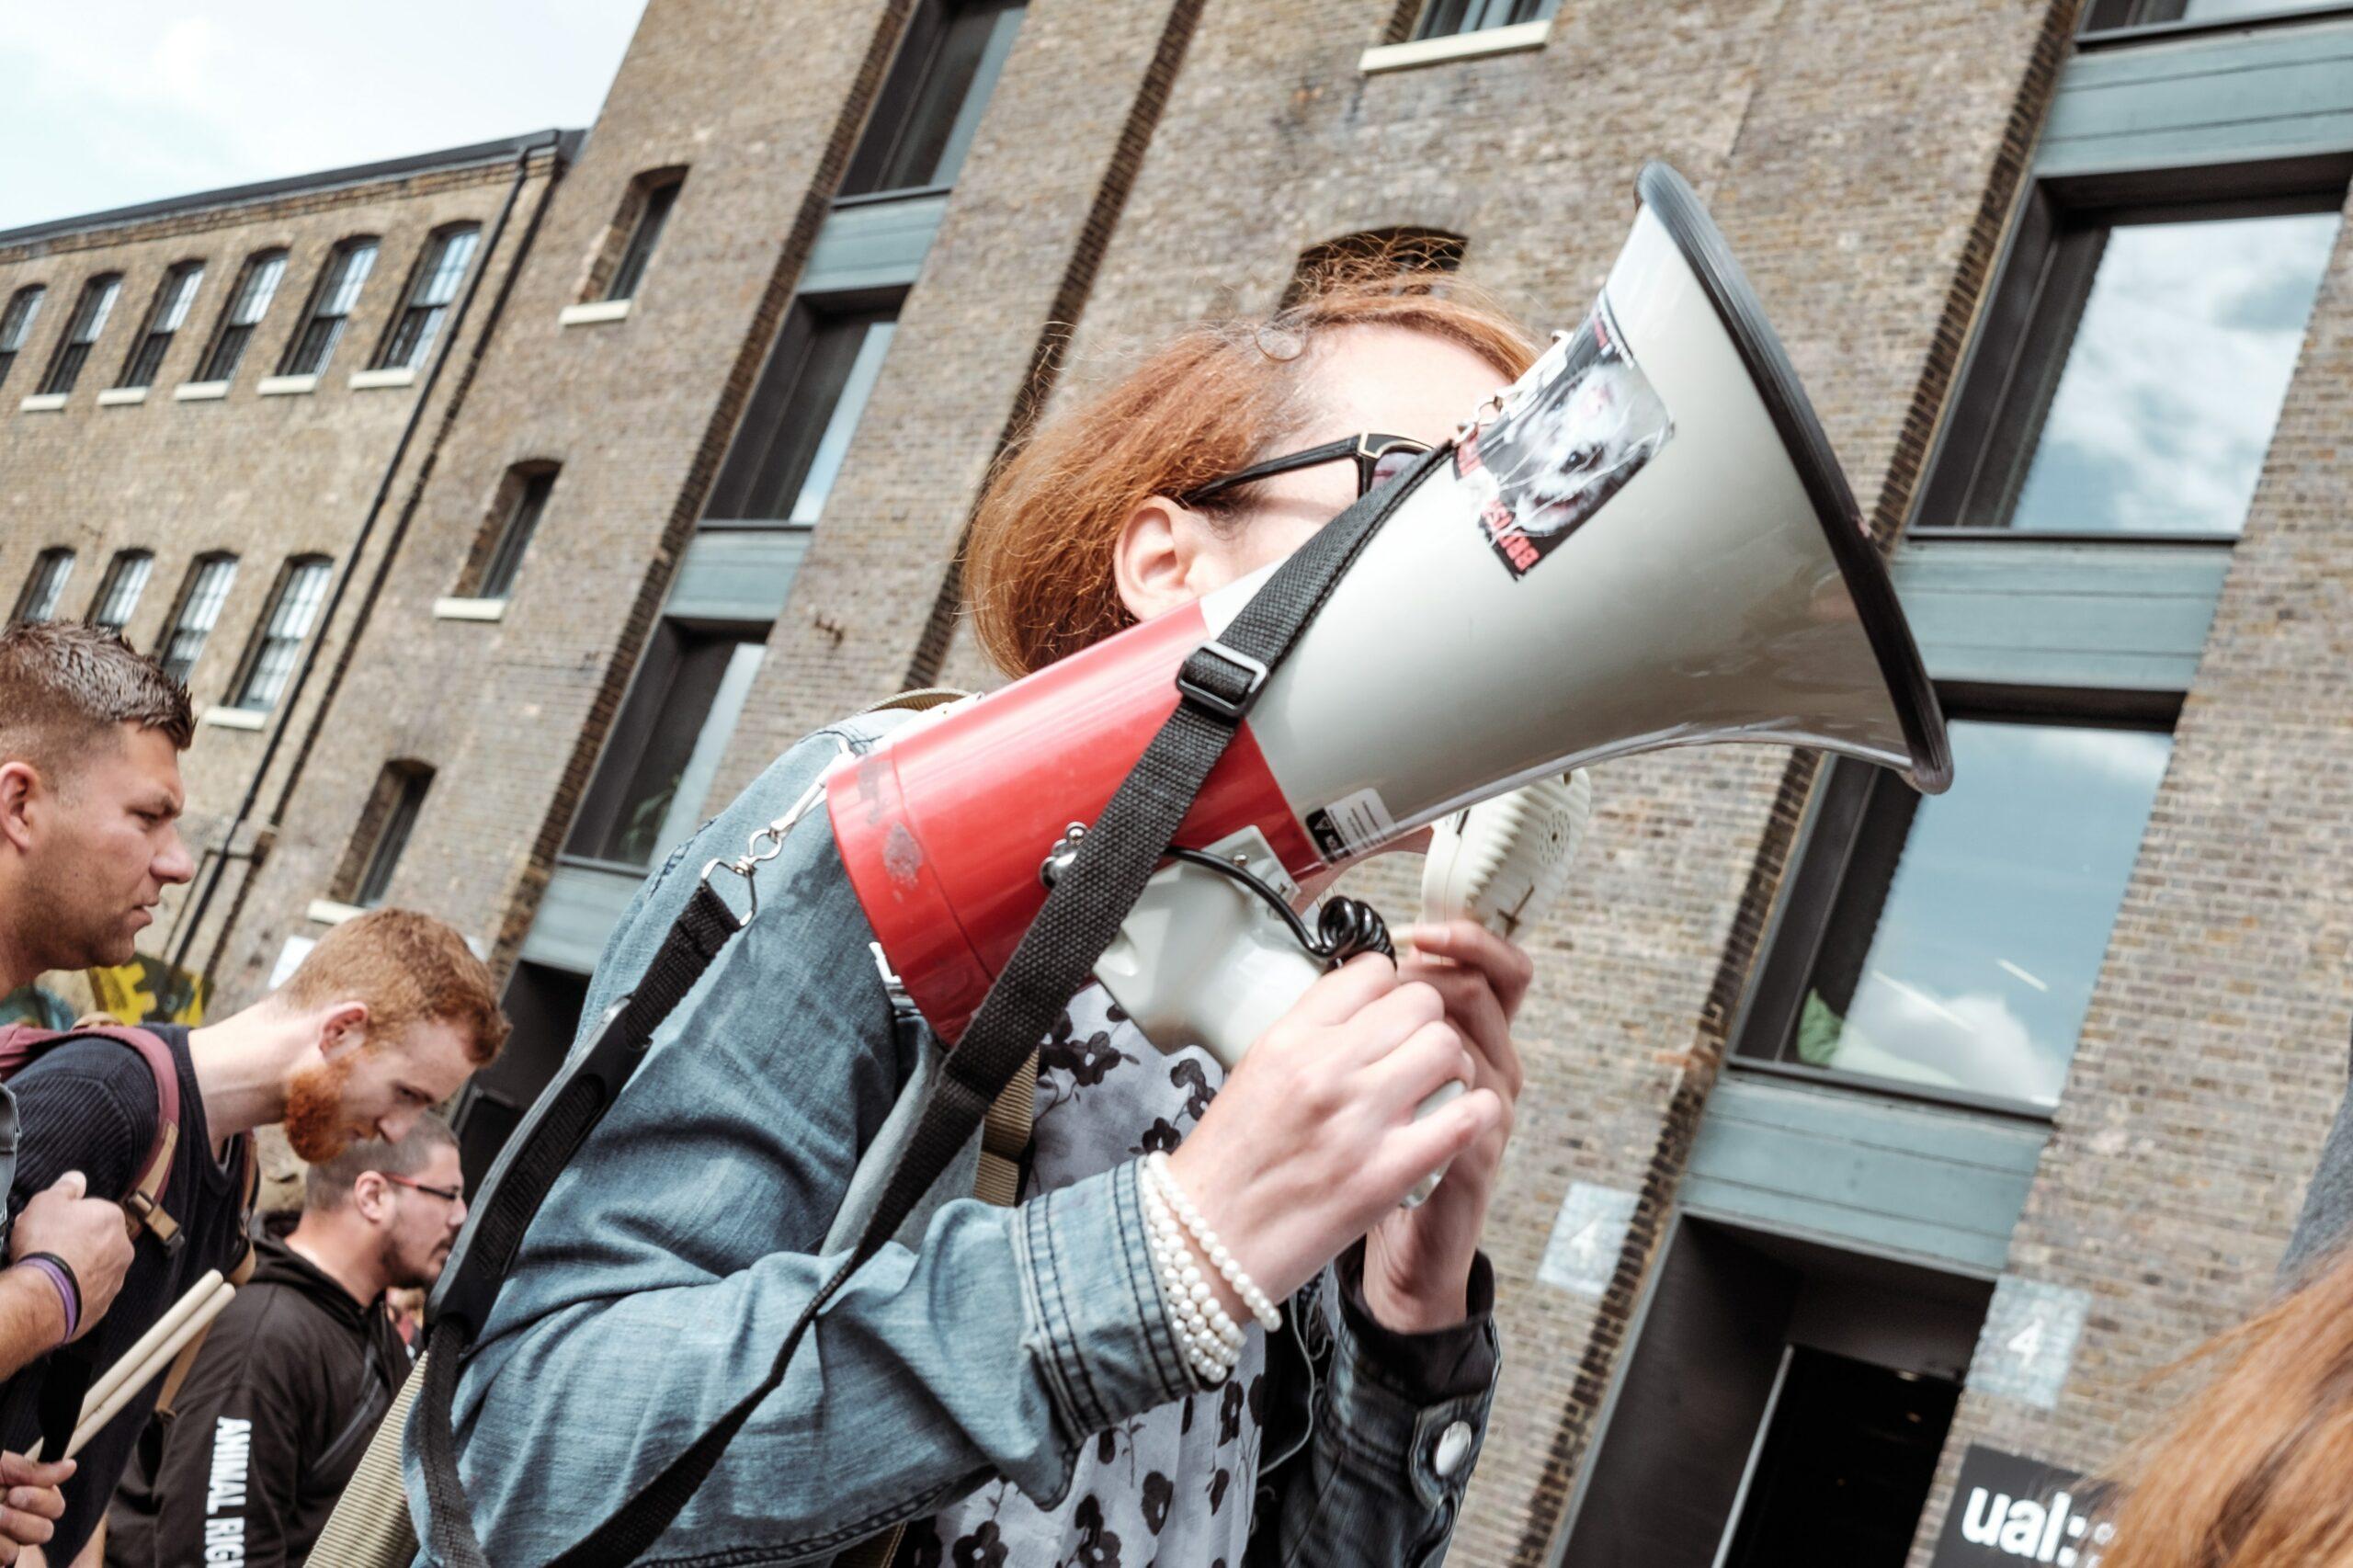 Lanceurs d'alerte association whistleblower whistleblowing